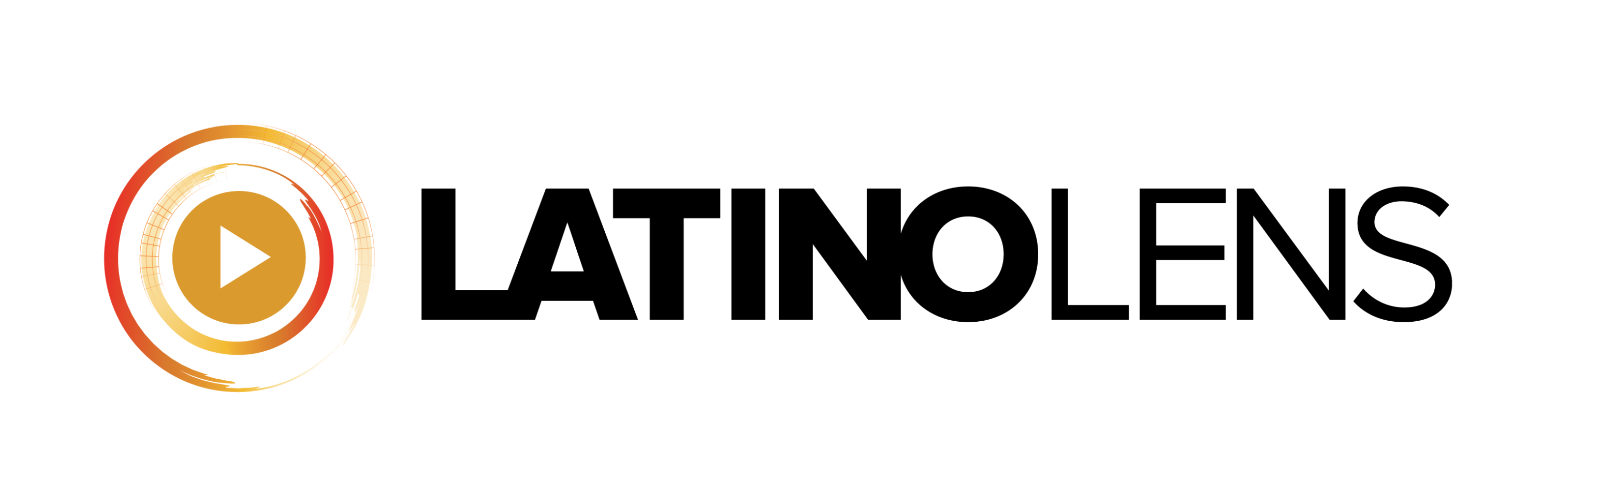 LatinoLens-HomeSlider.png